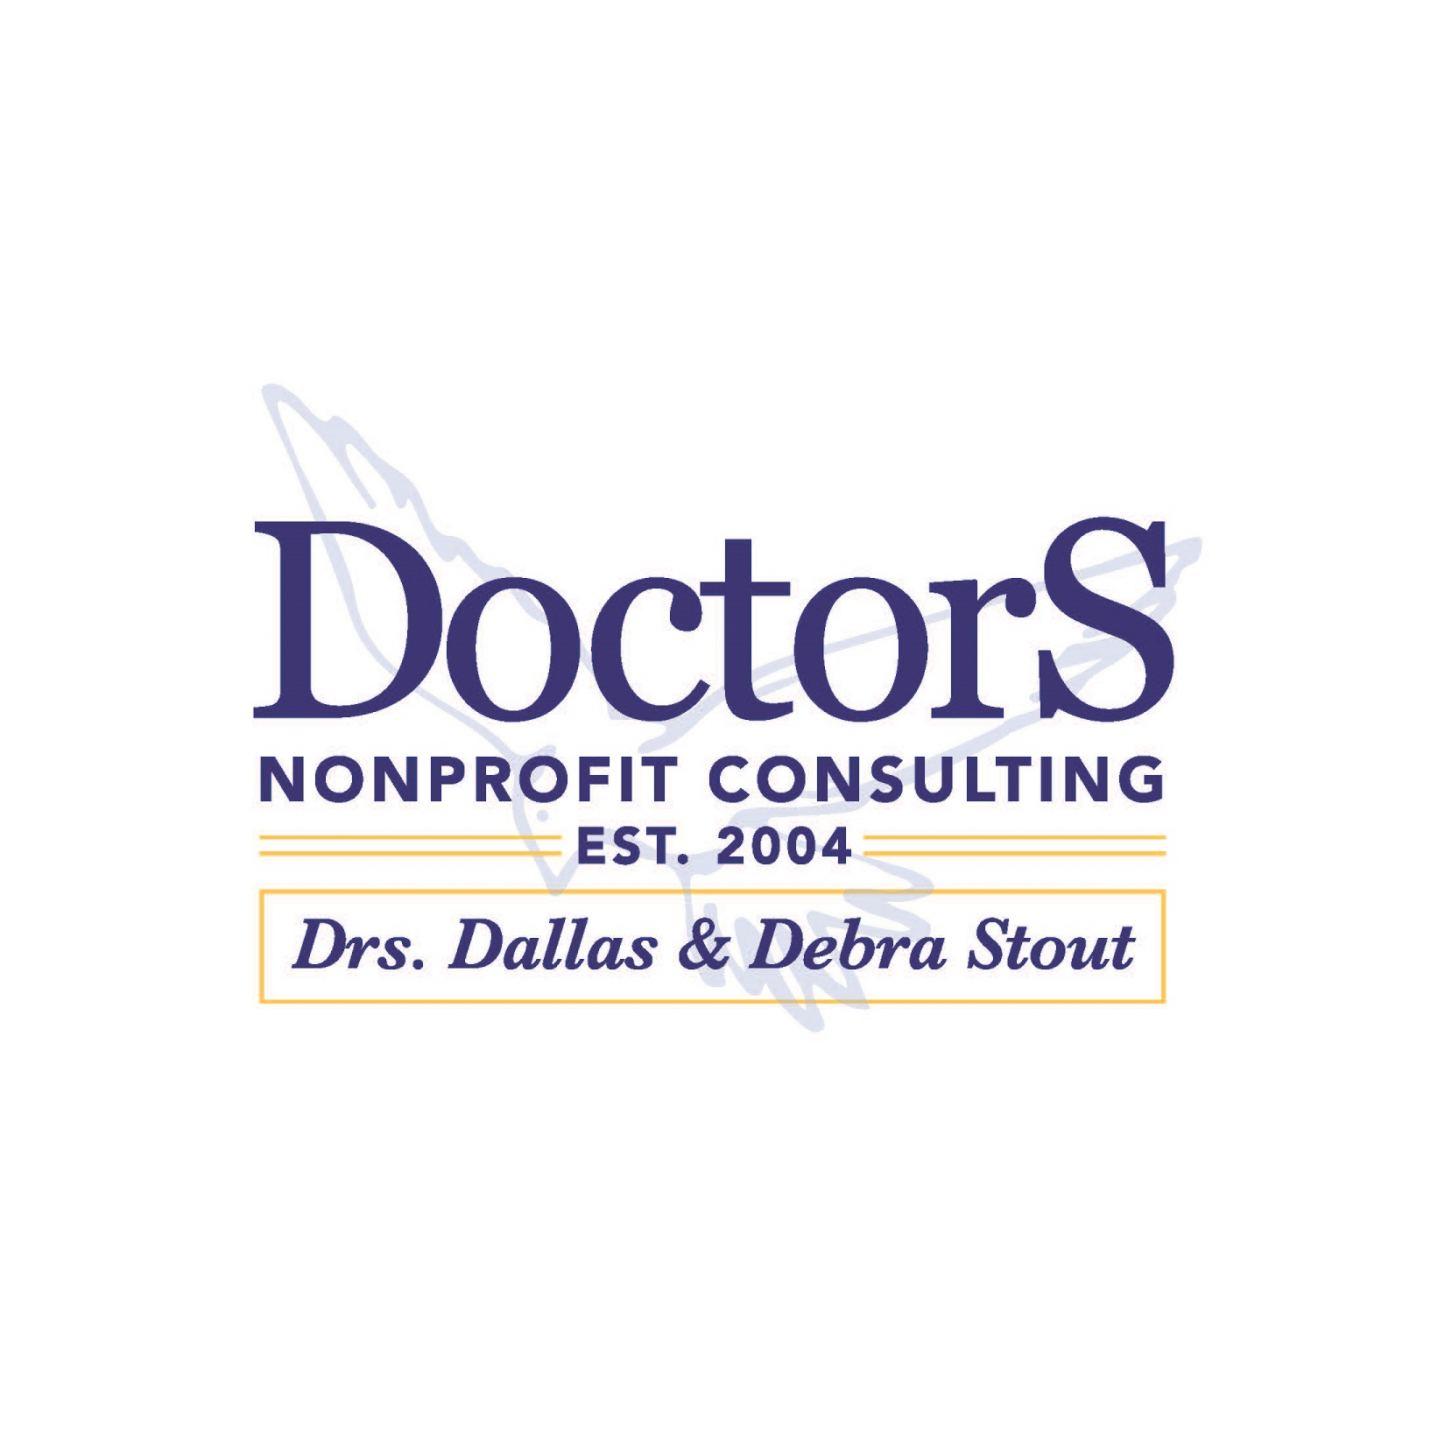 DoctorS Nonprofit Consulting Logo